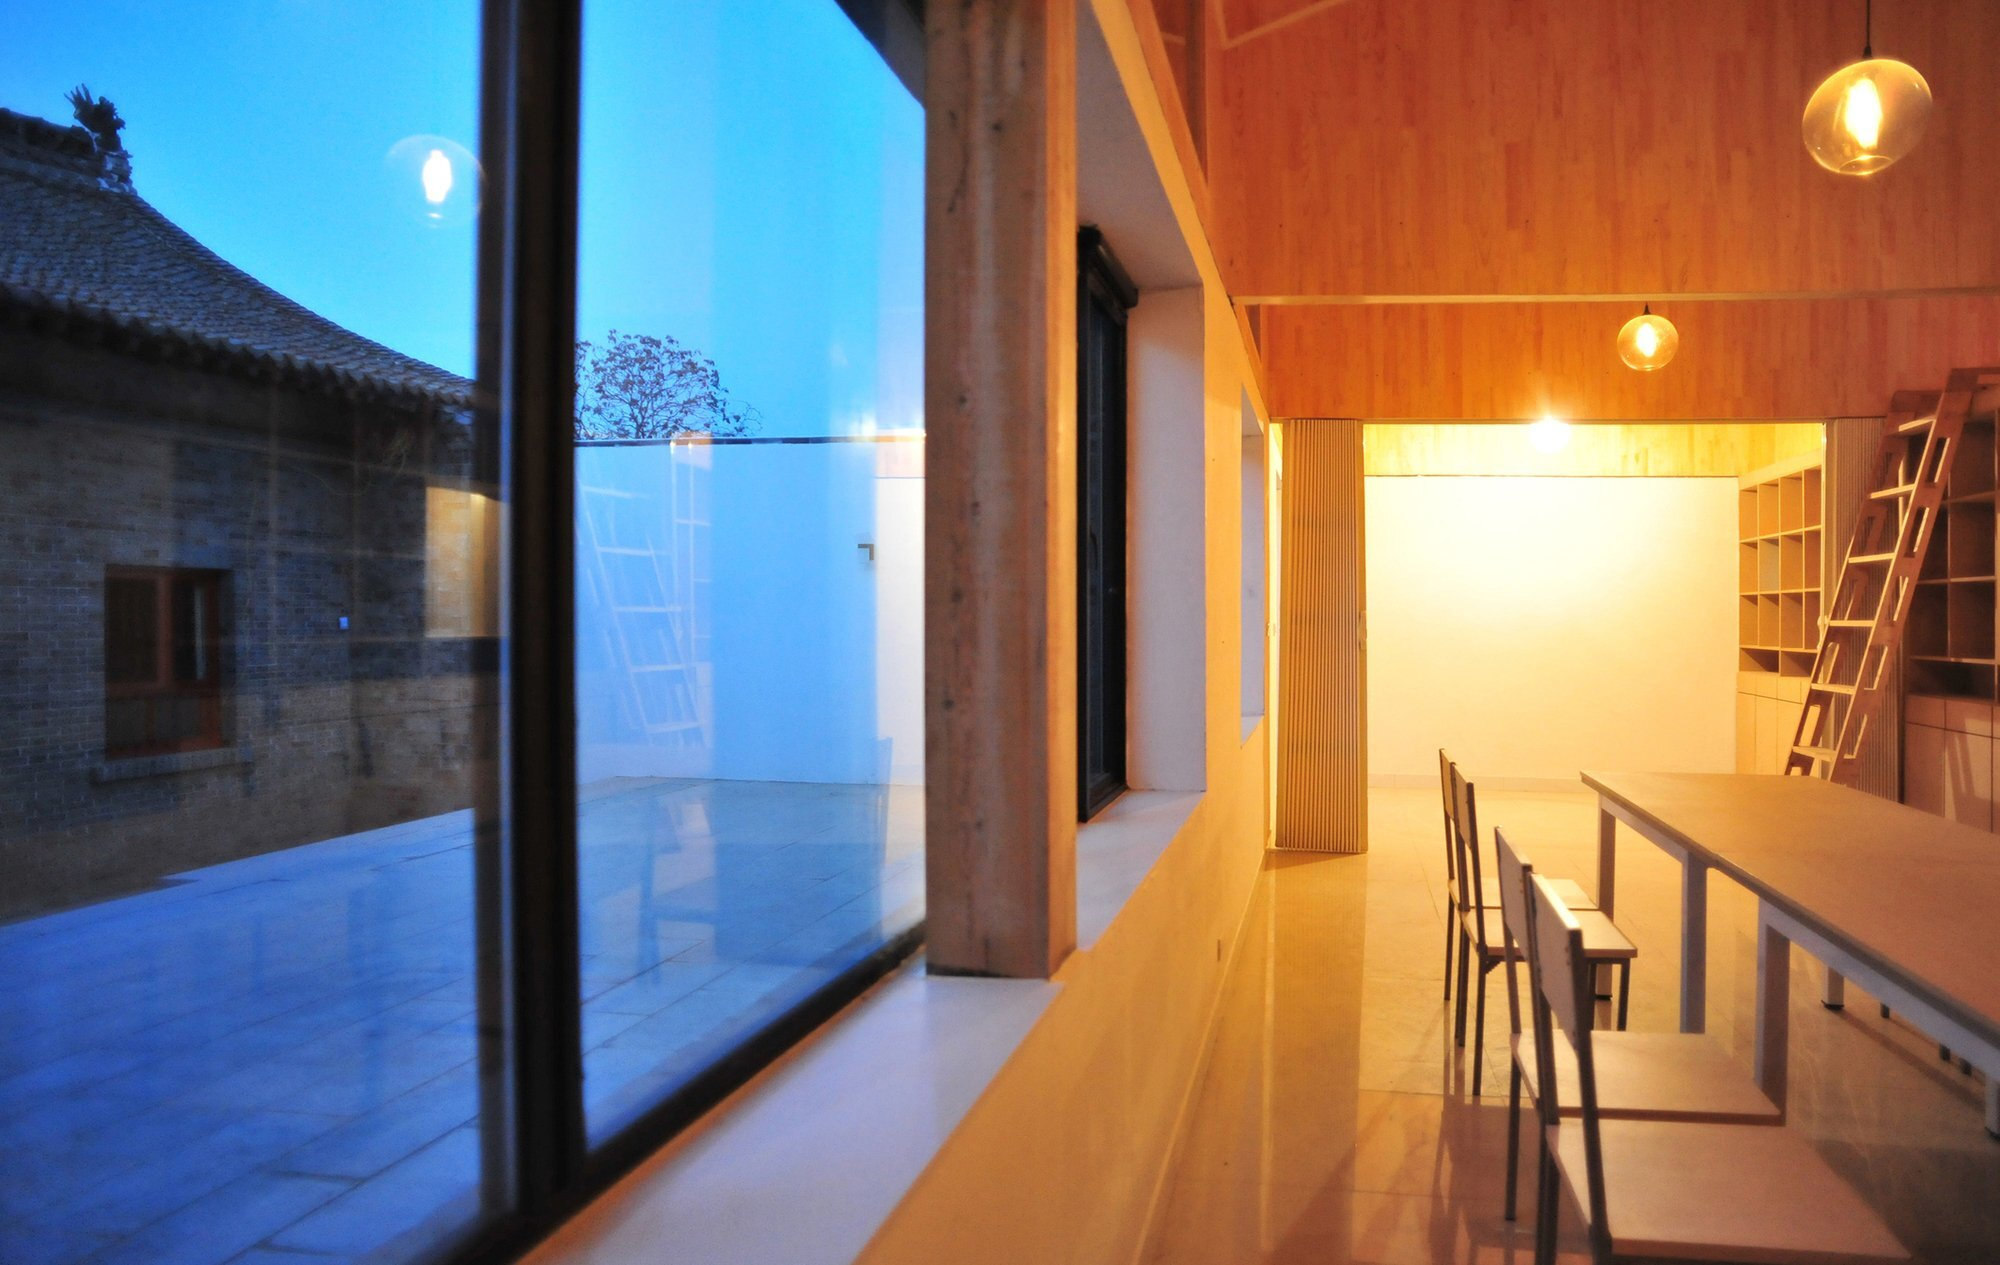 Ban House - Small House - Zhang Dongguang & Liu Wenjuan - Shaanxi China - Window View - Humble Homes